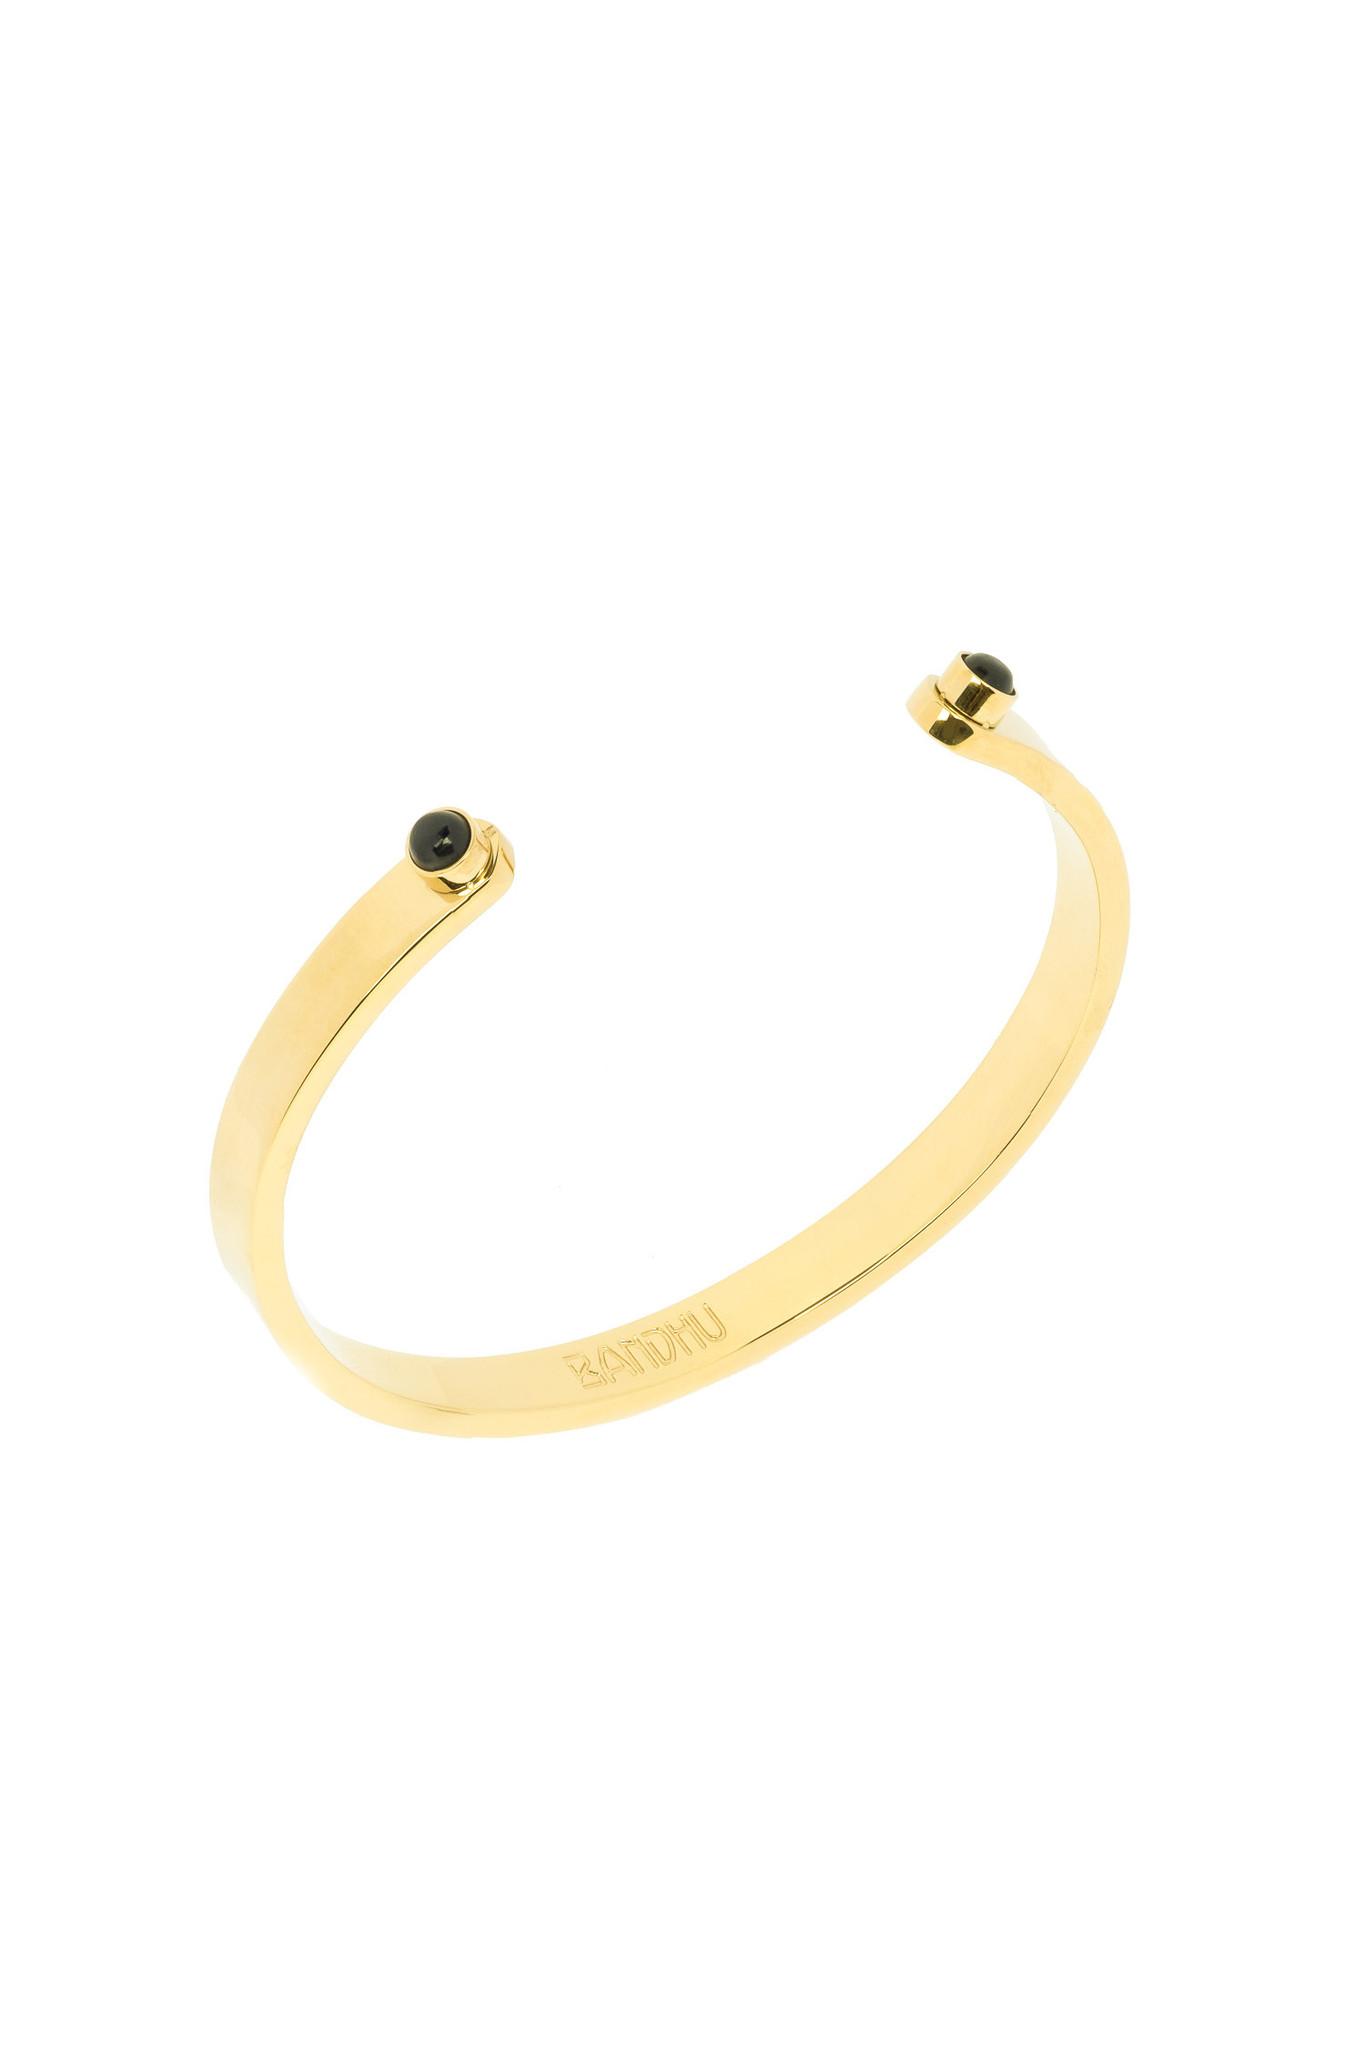 Energy Muse Bracelet - Gold-1